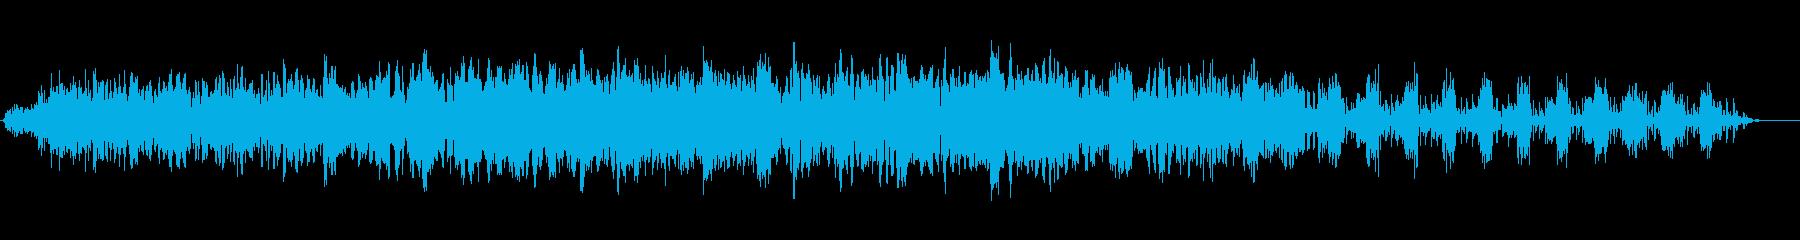 SciFi EC01_84_1の再生済みの波形